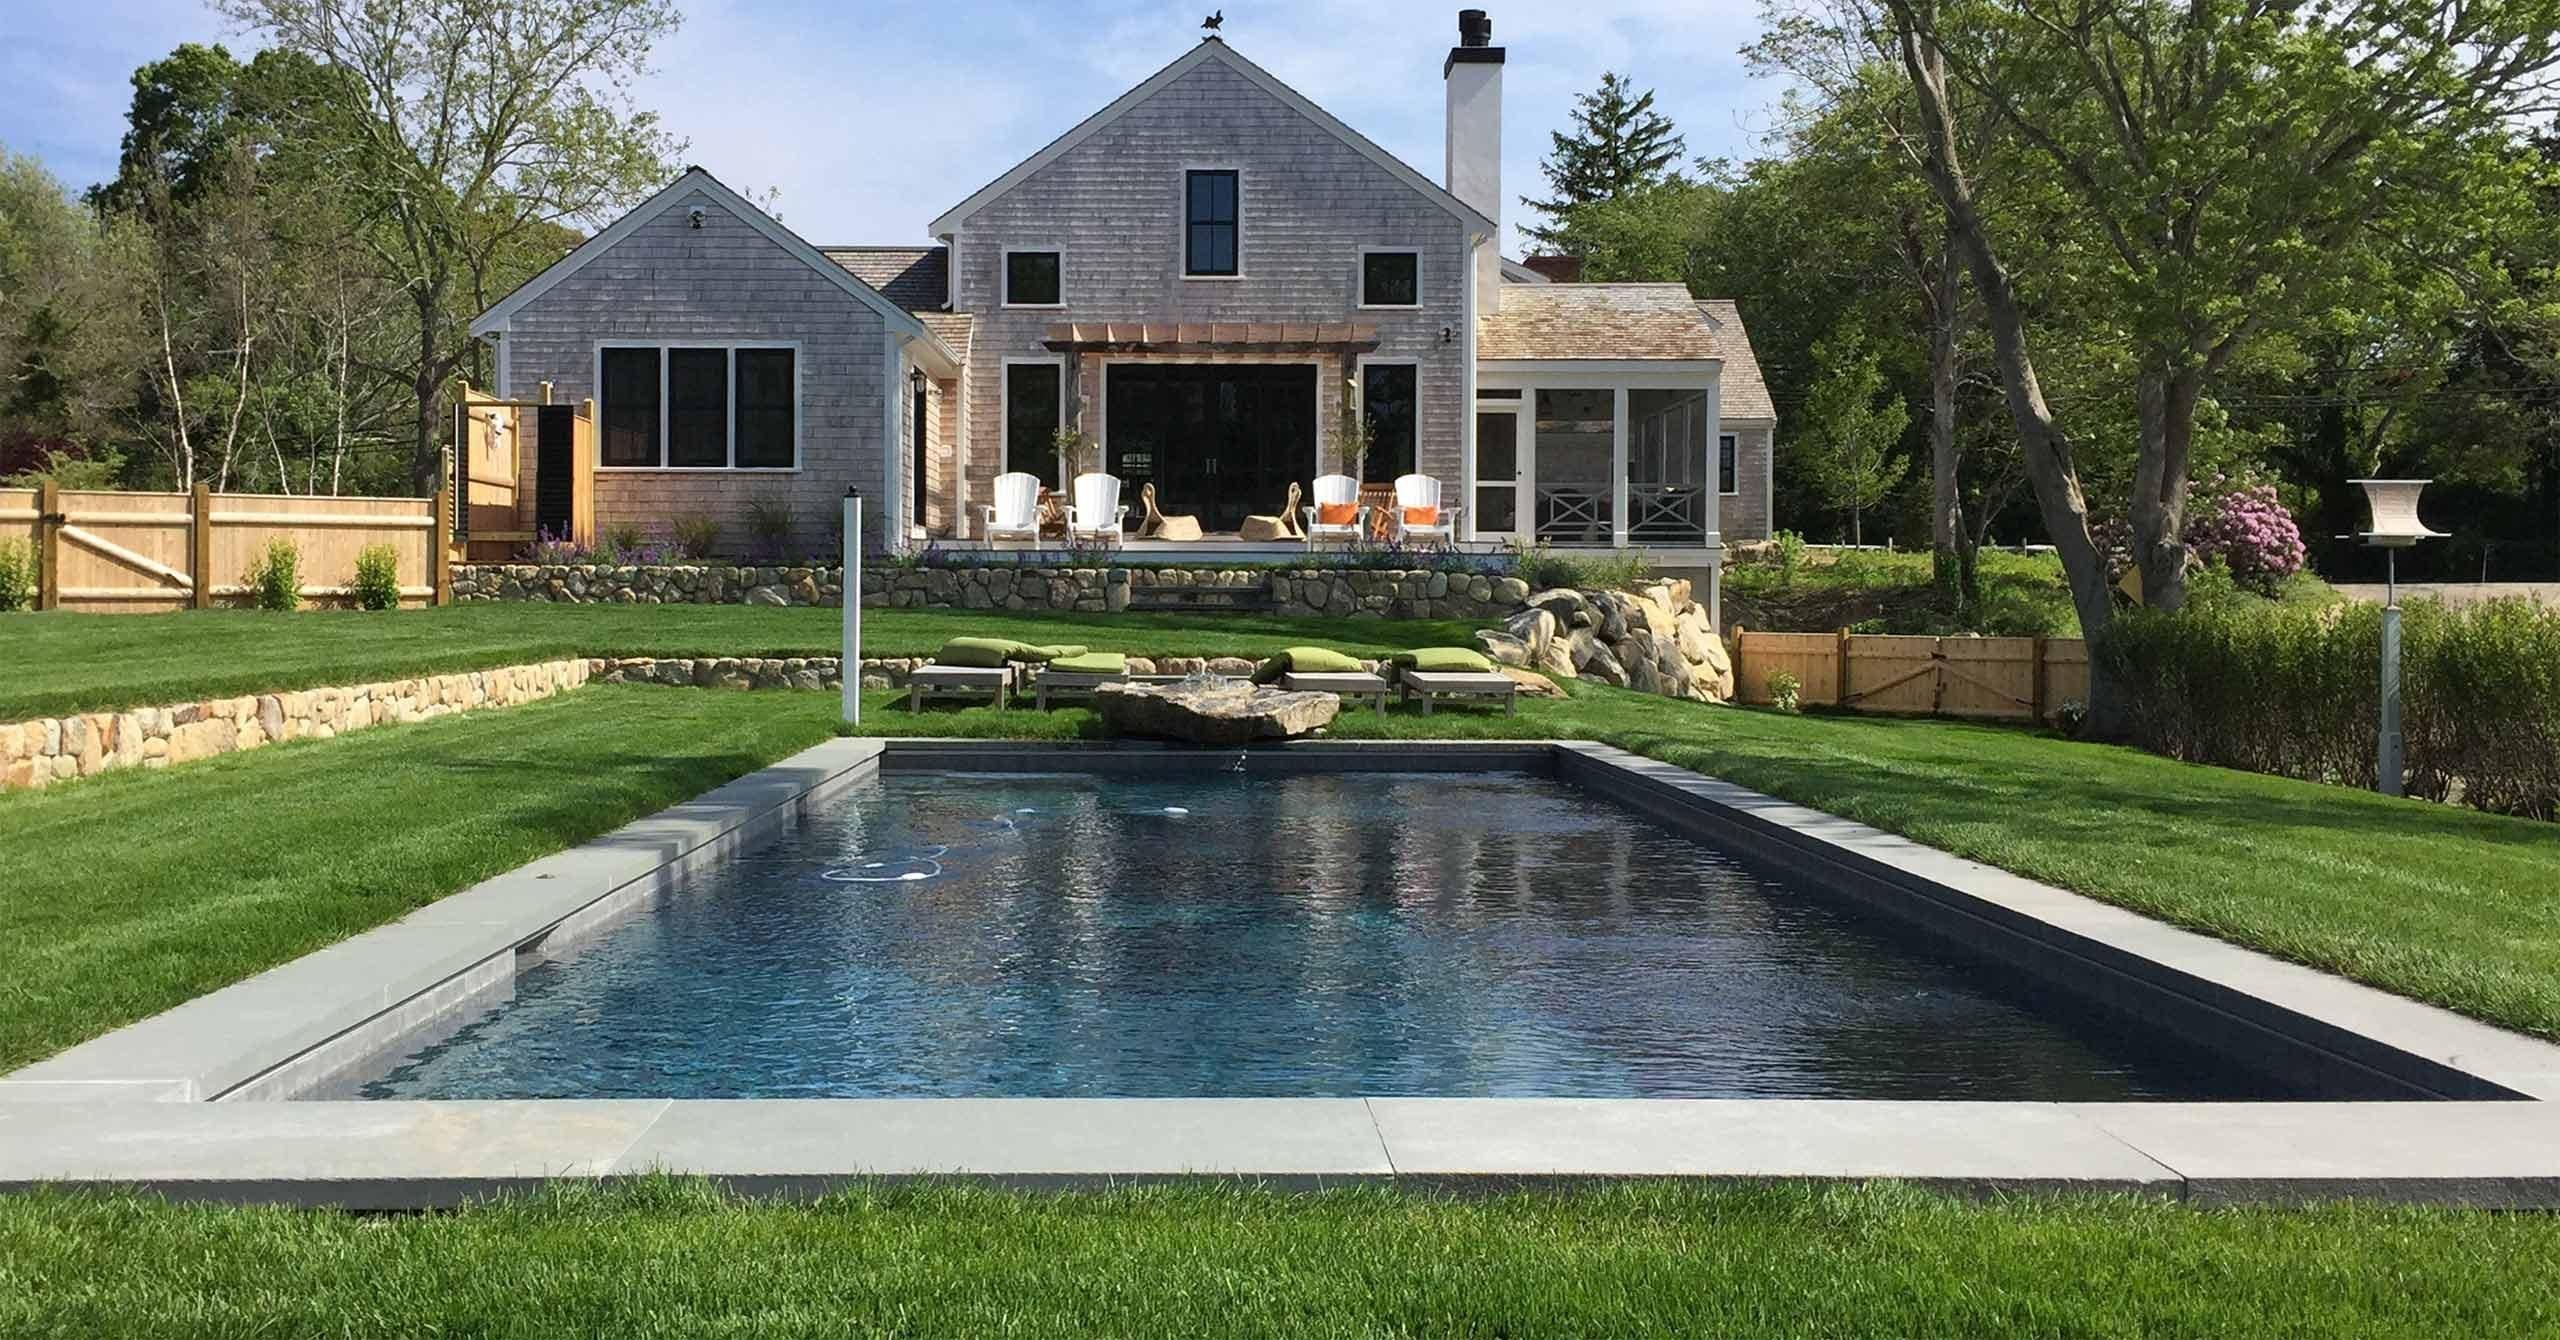 Pool set into ground with grass around it